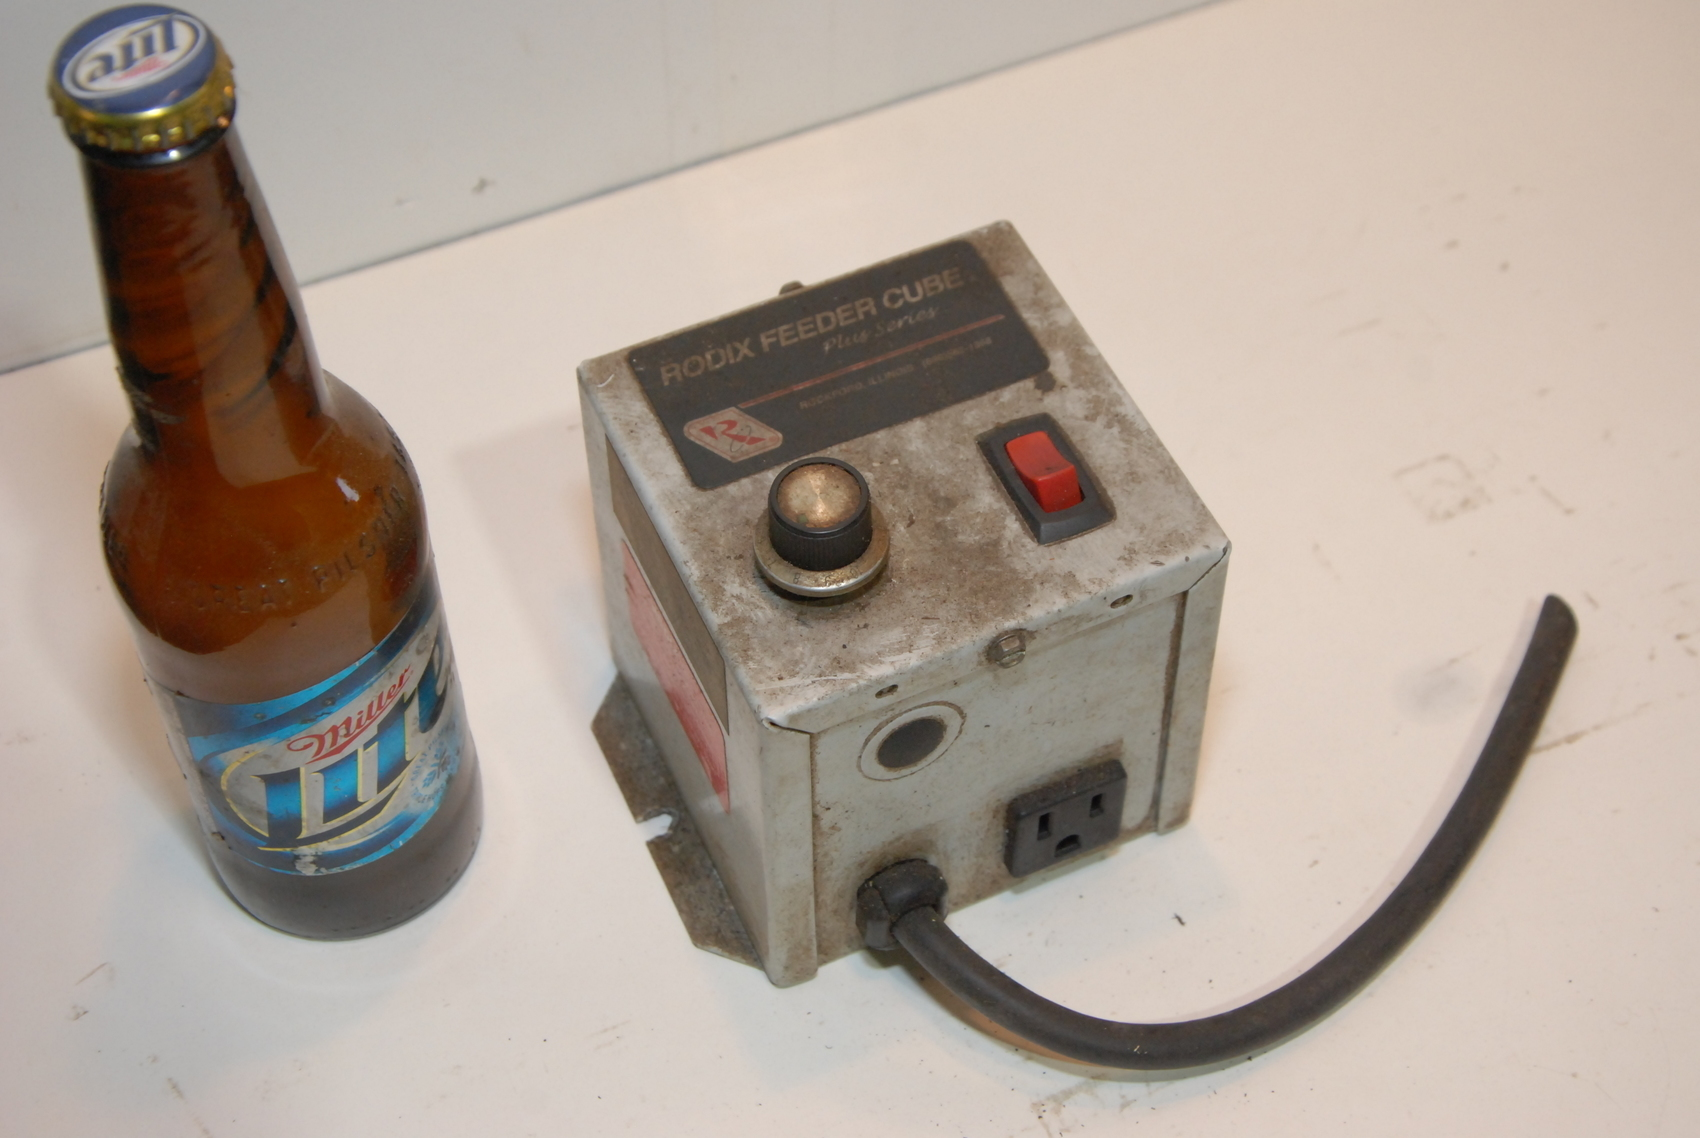 RODIX FEEDER CUBE controller PLUS SERIES FC-43.PLUS.P/N.121-880